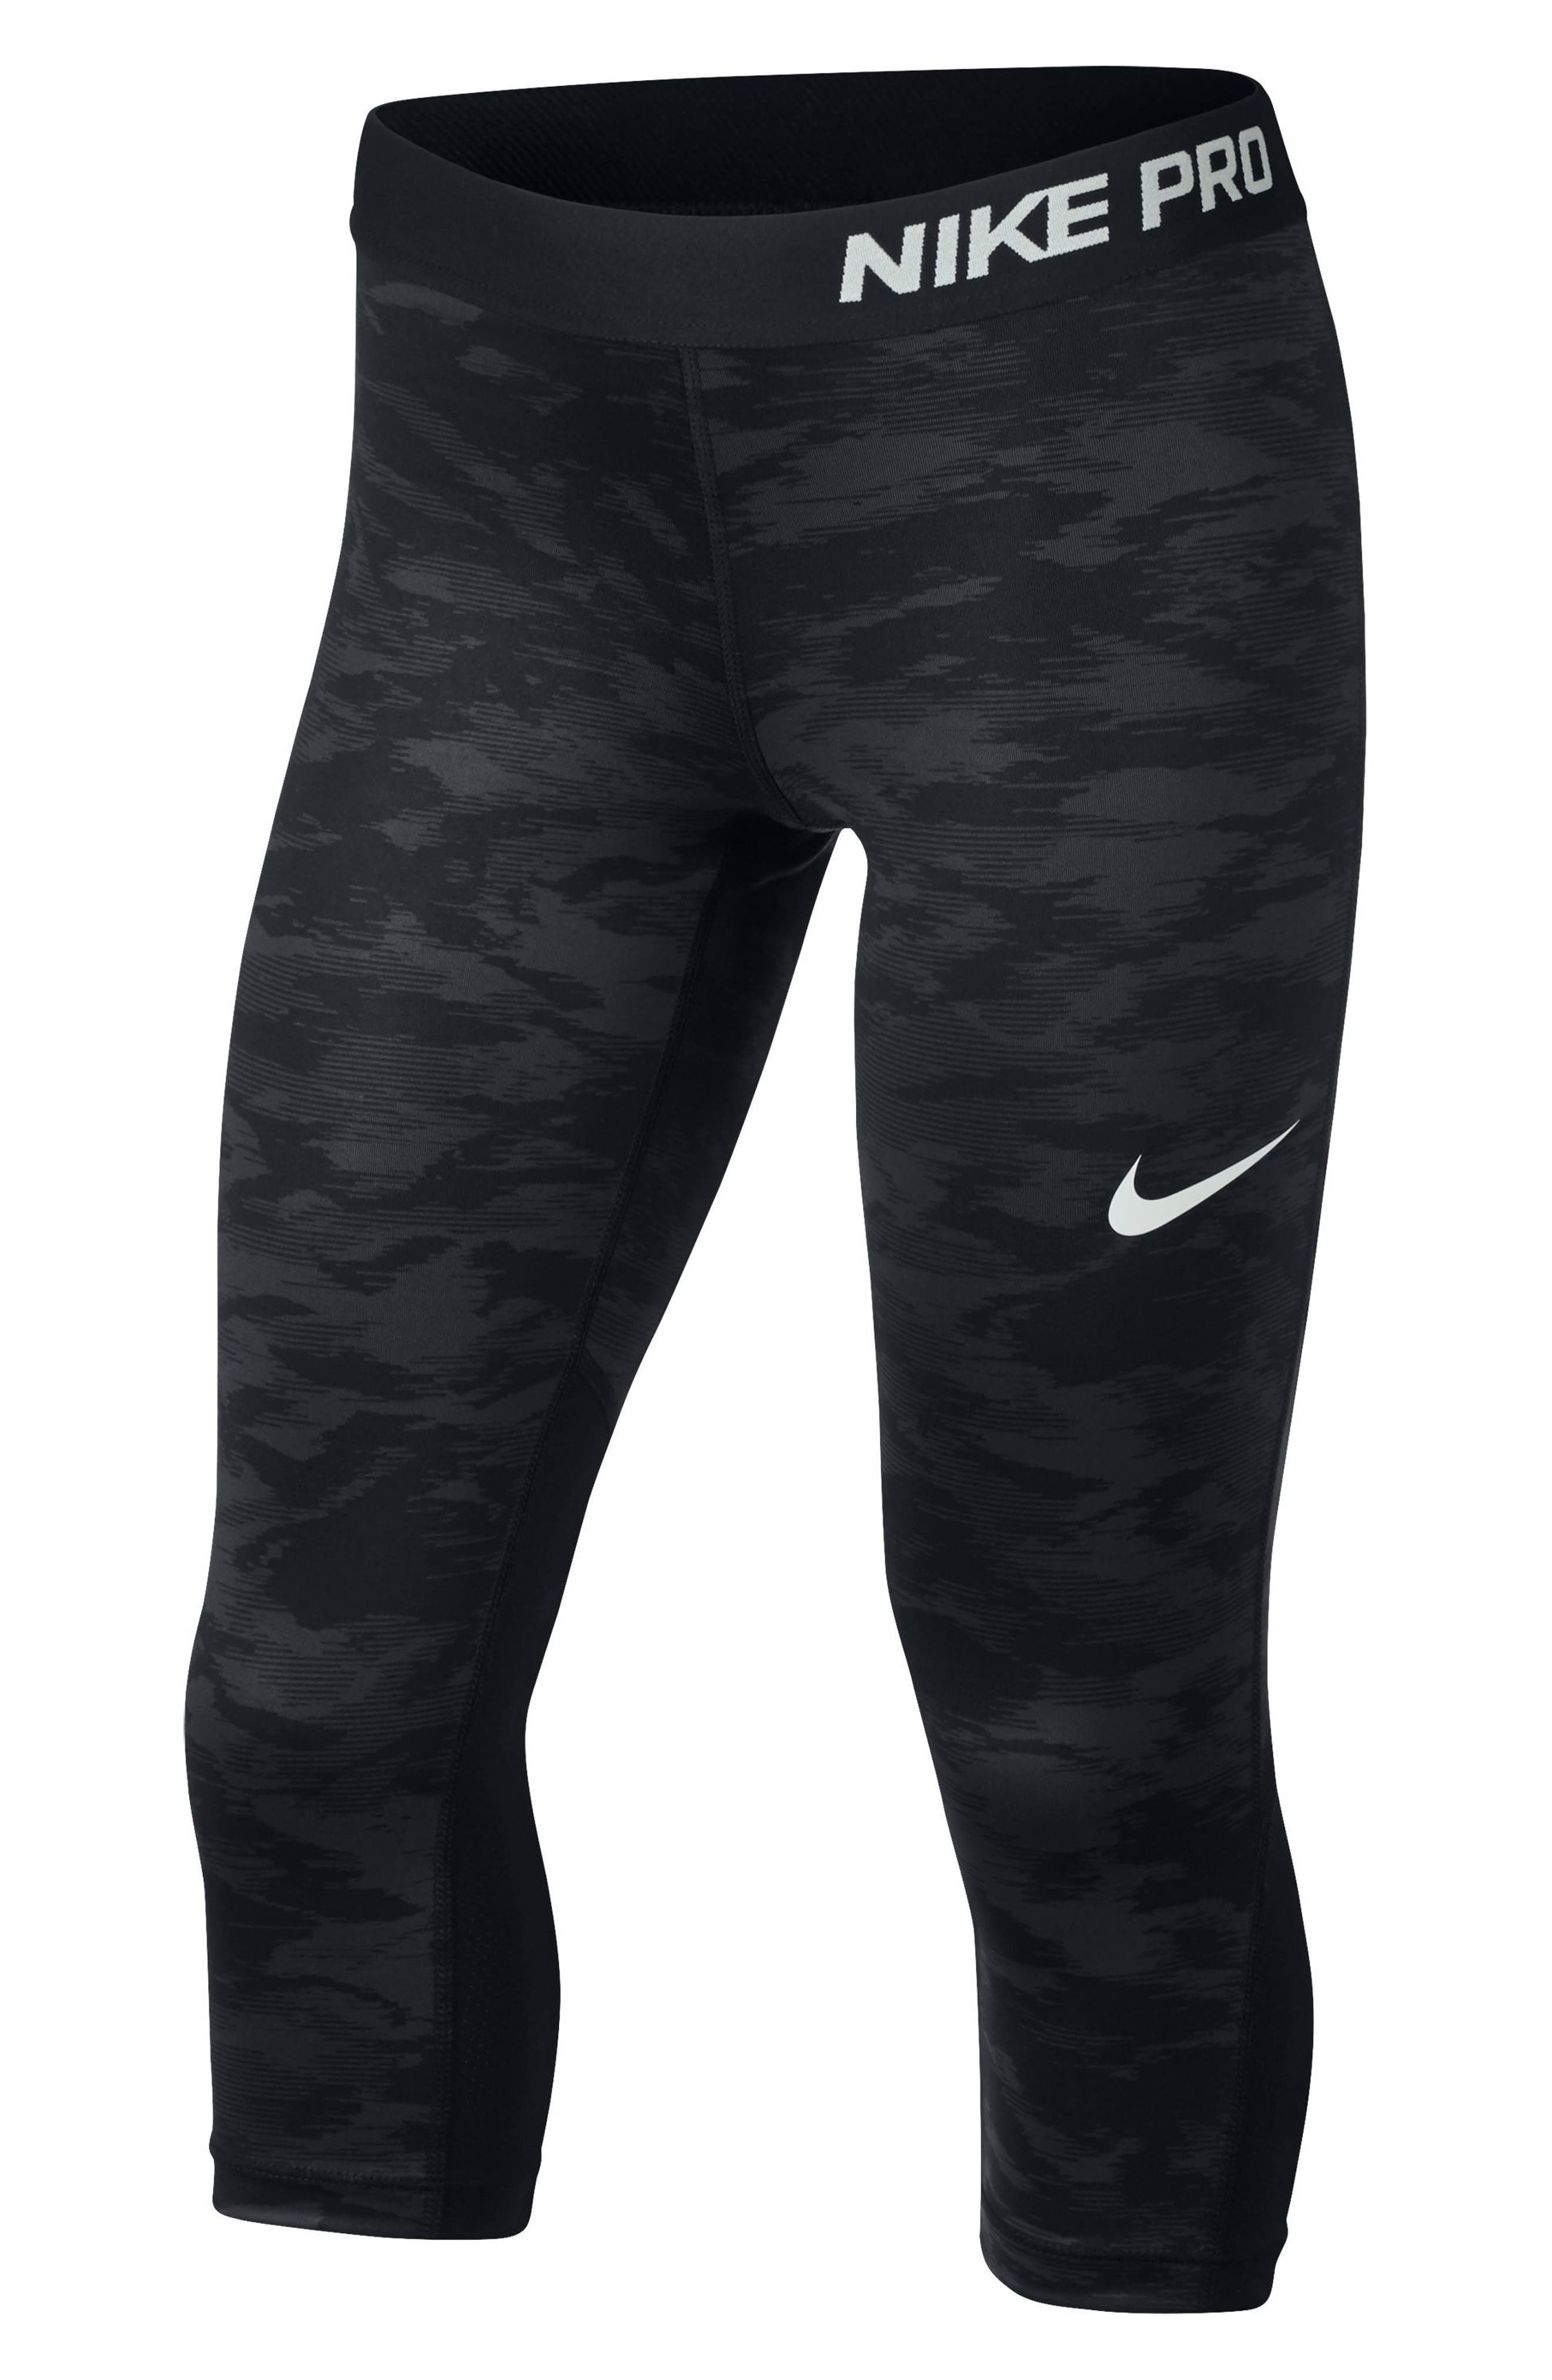 Pro Cool Crop Leggings,                         Main,                         color, Black/ Pure Platinum